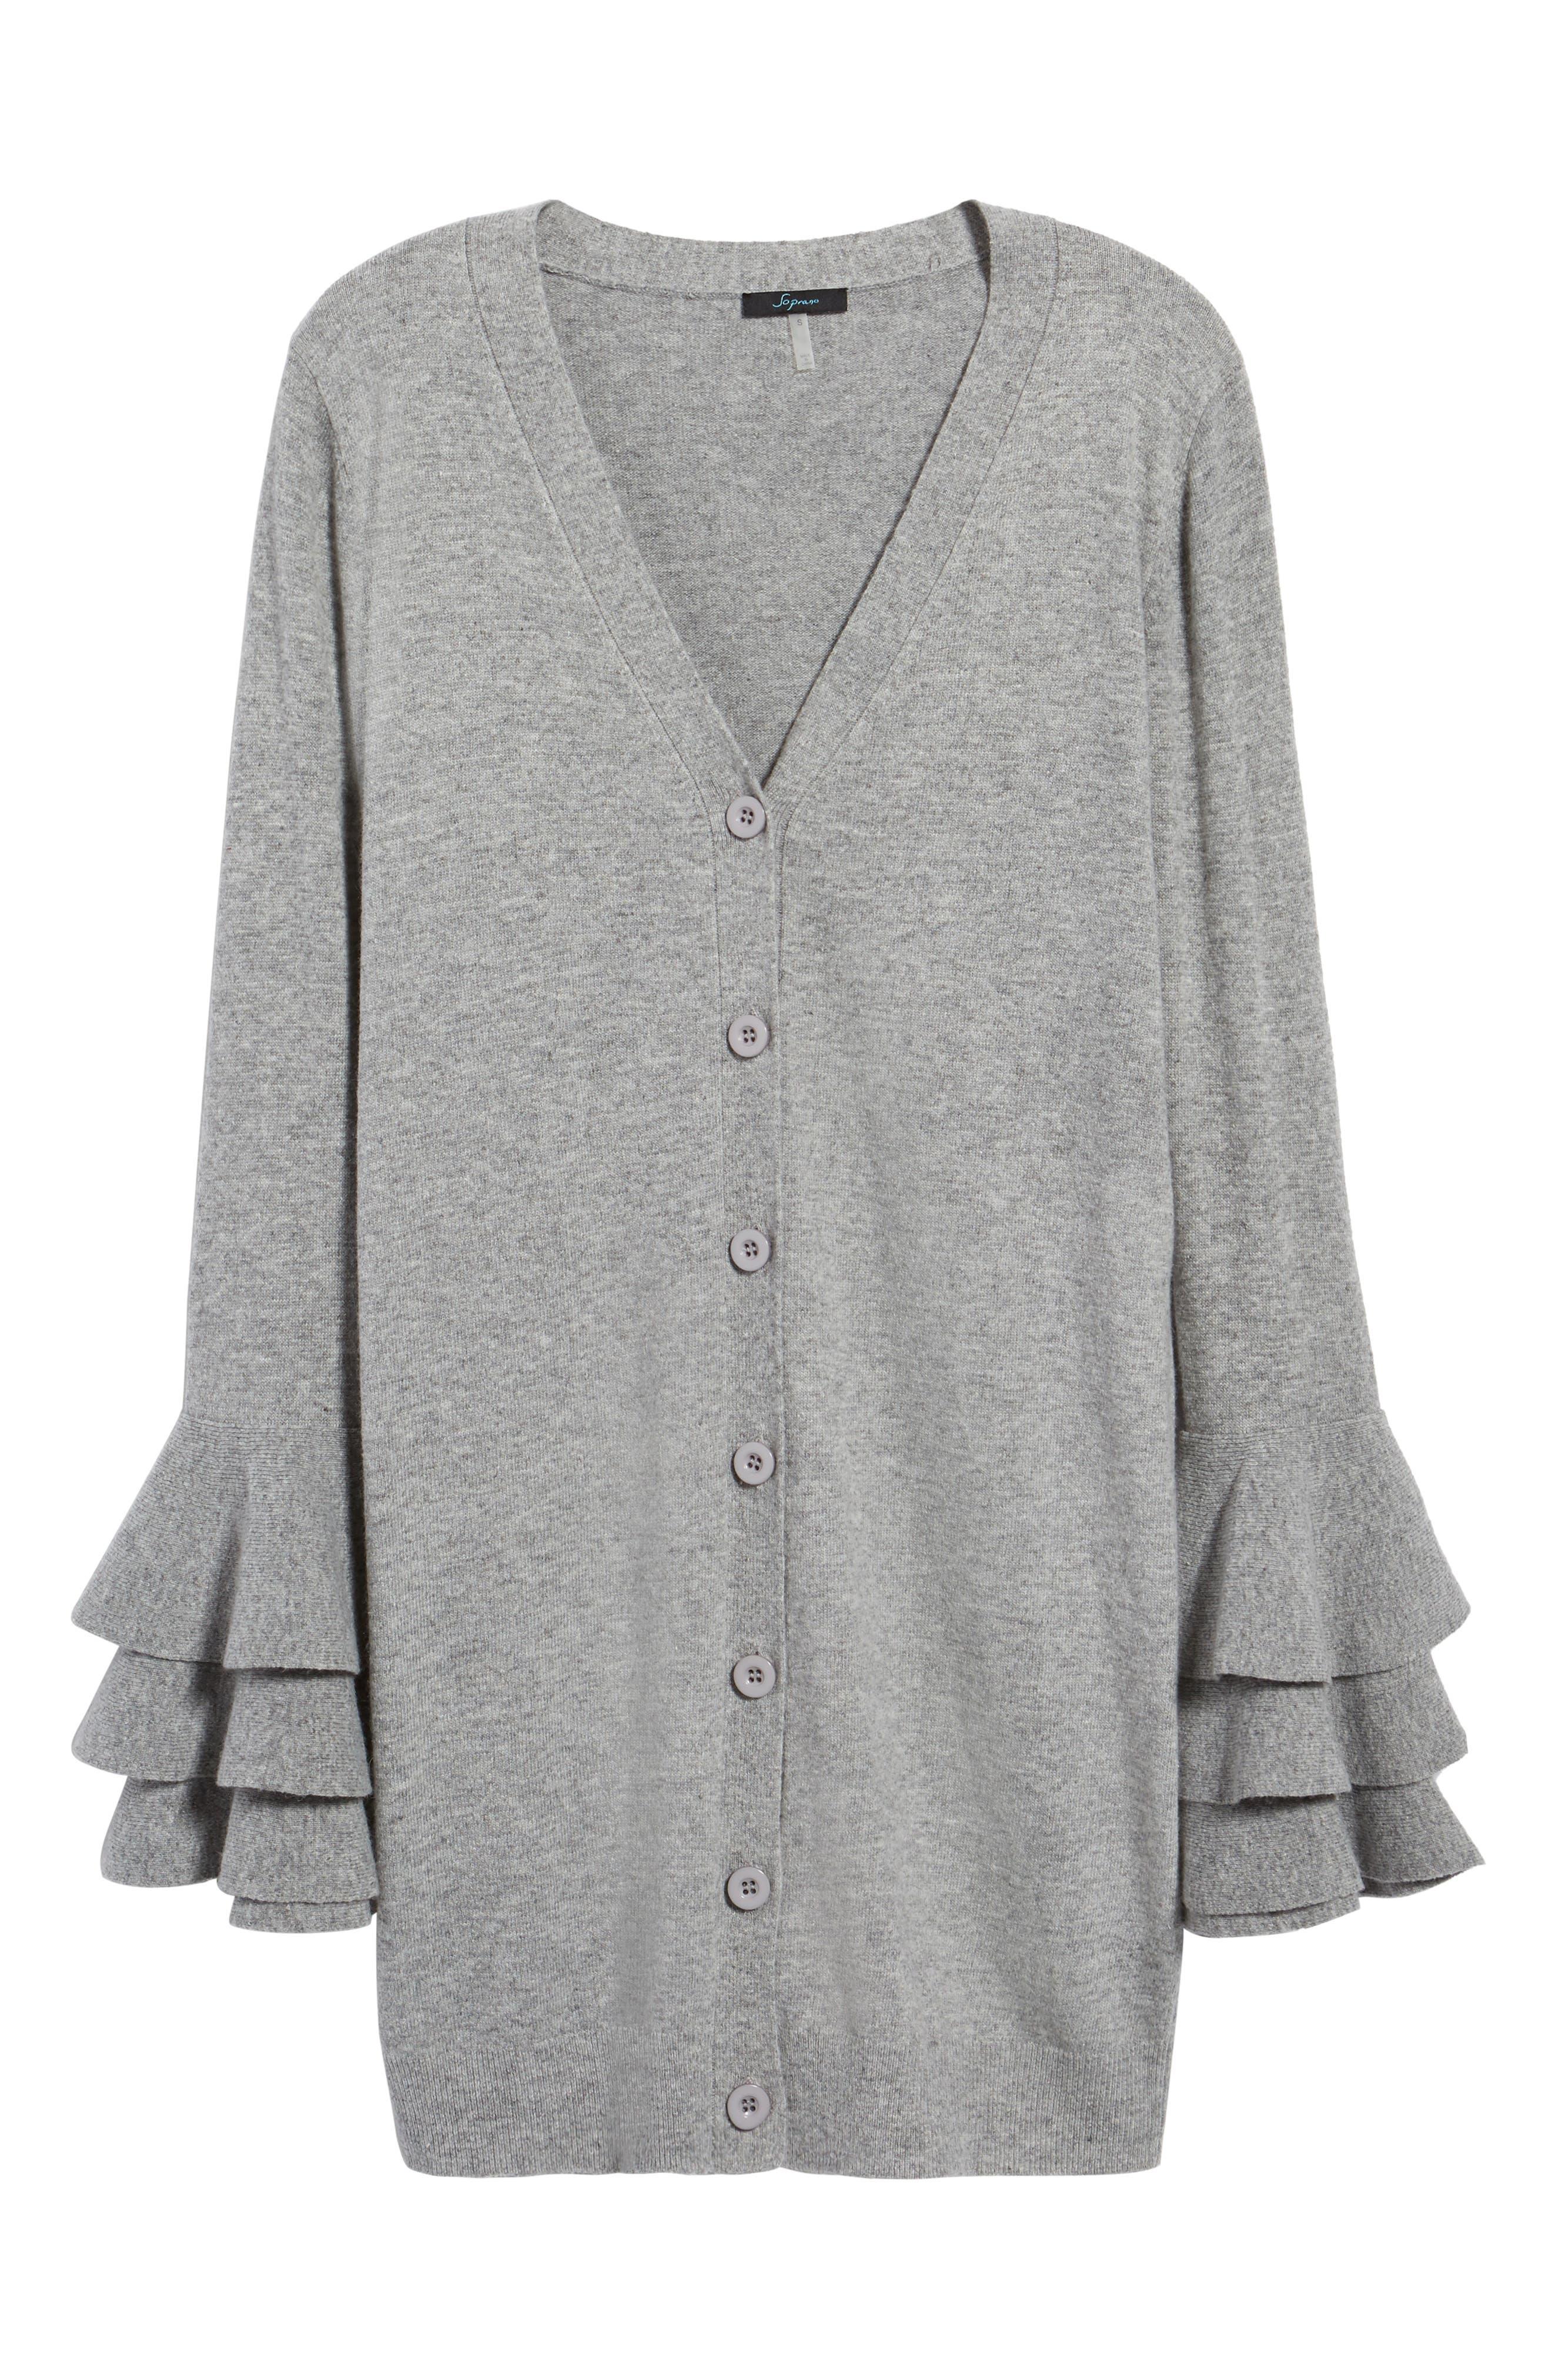 Ruffle Sleeve Longline Cardigan,                             Alternate thumbnail 6, color,                             Grey